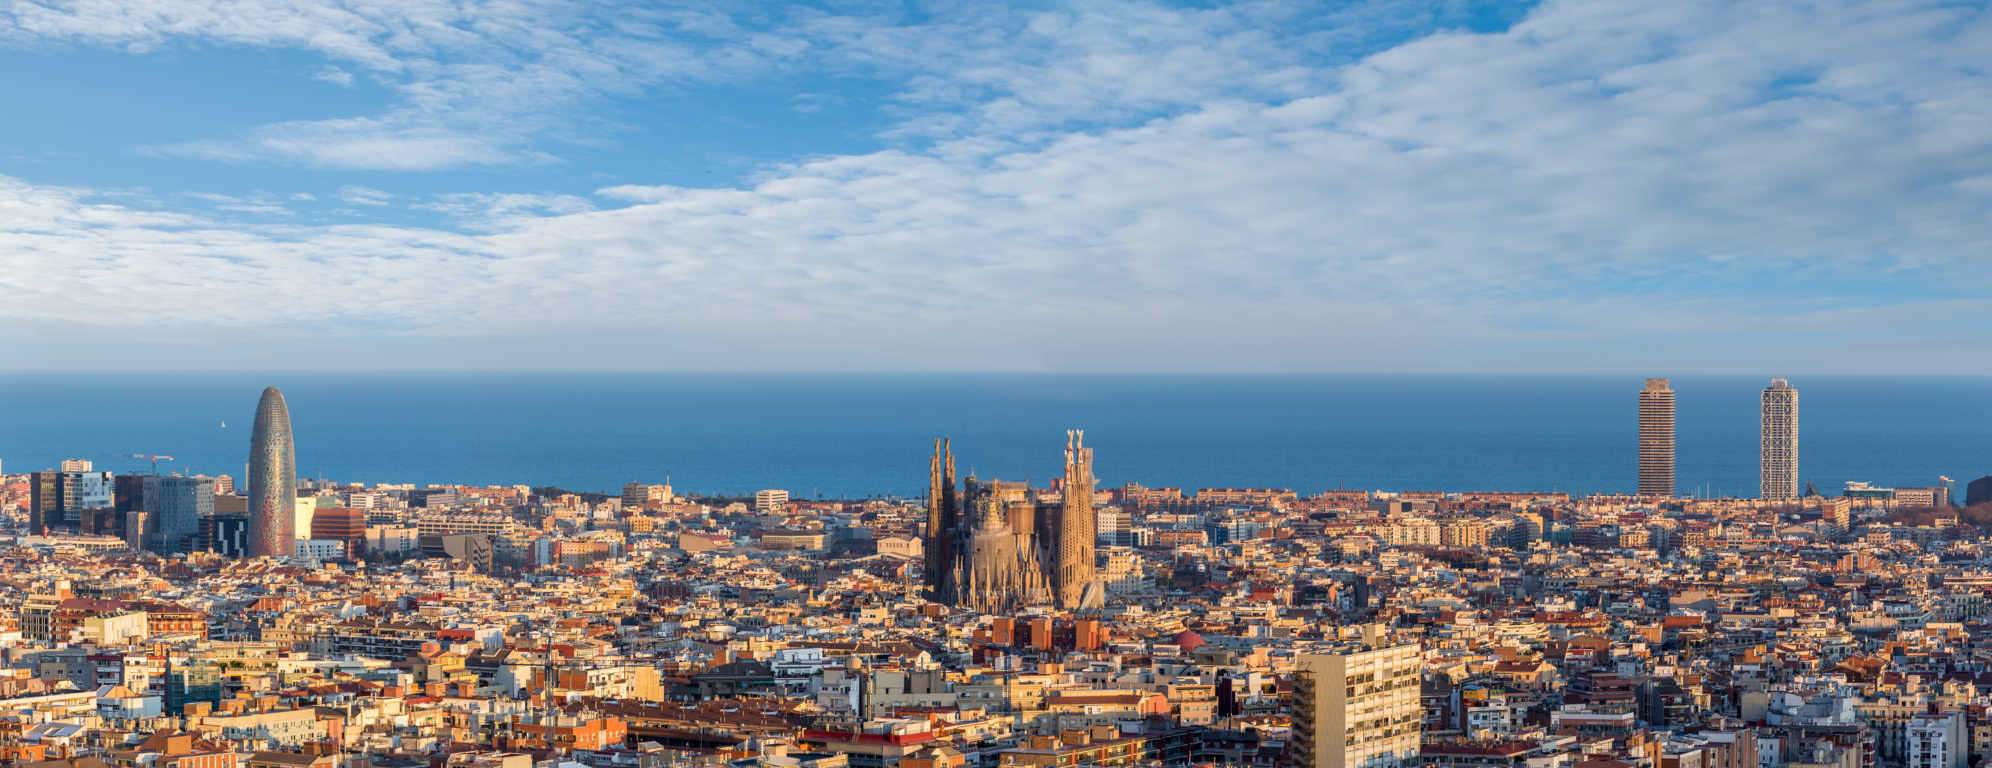 Barcelona se desborda